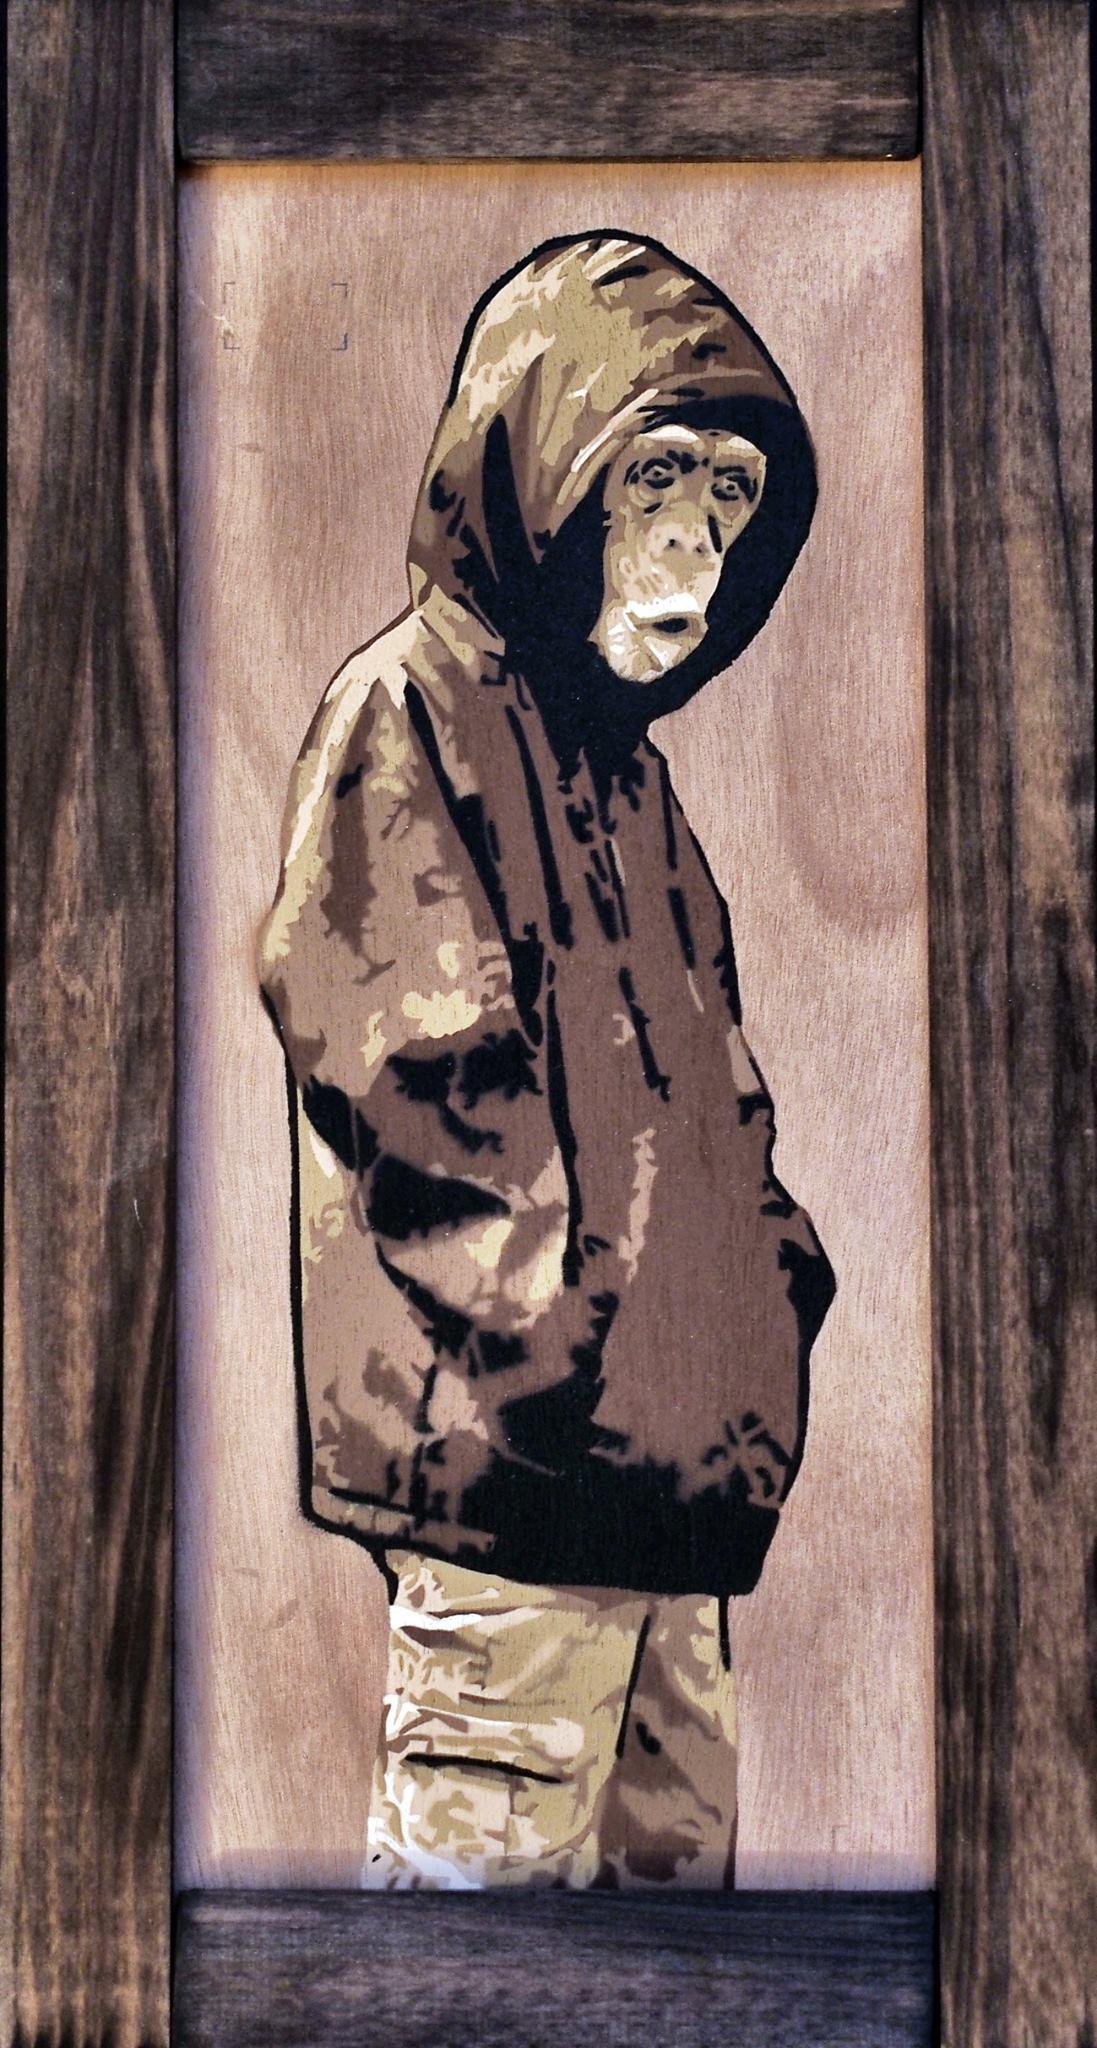 Manimal Chimpanzee